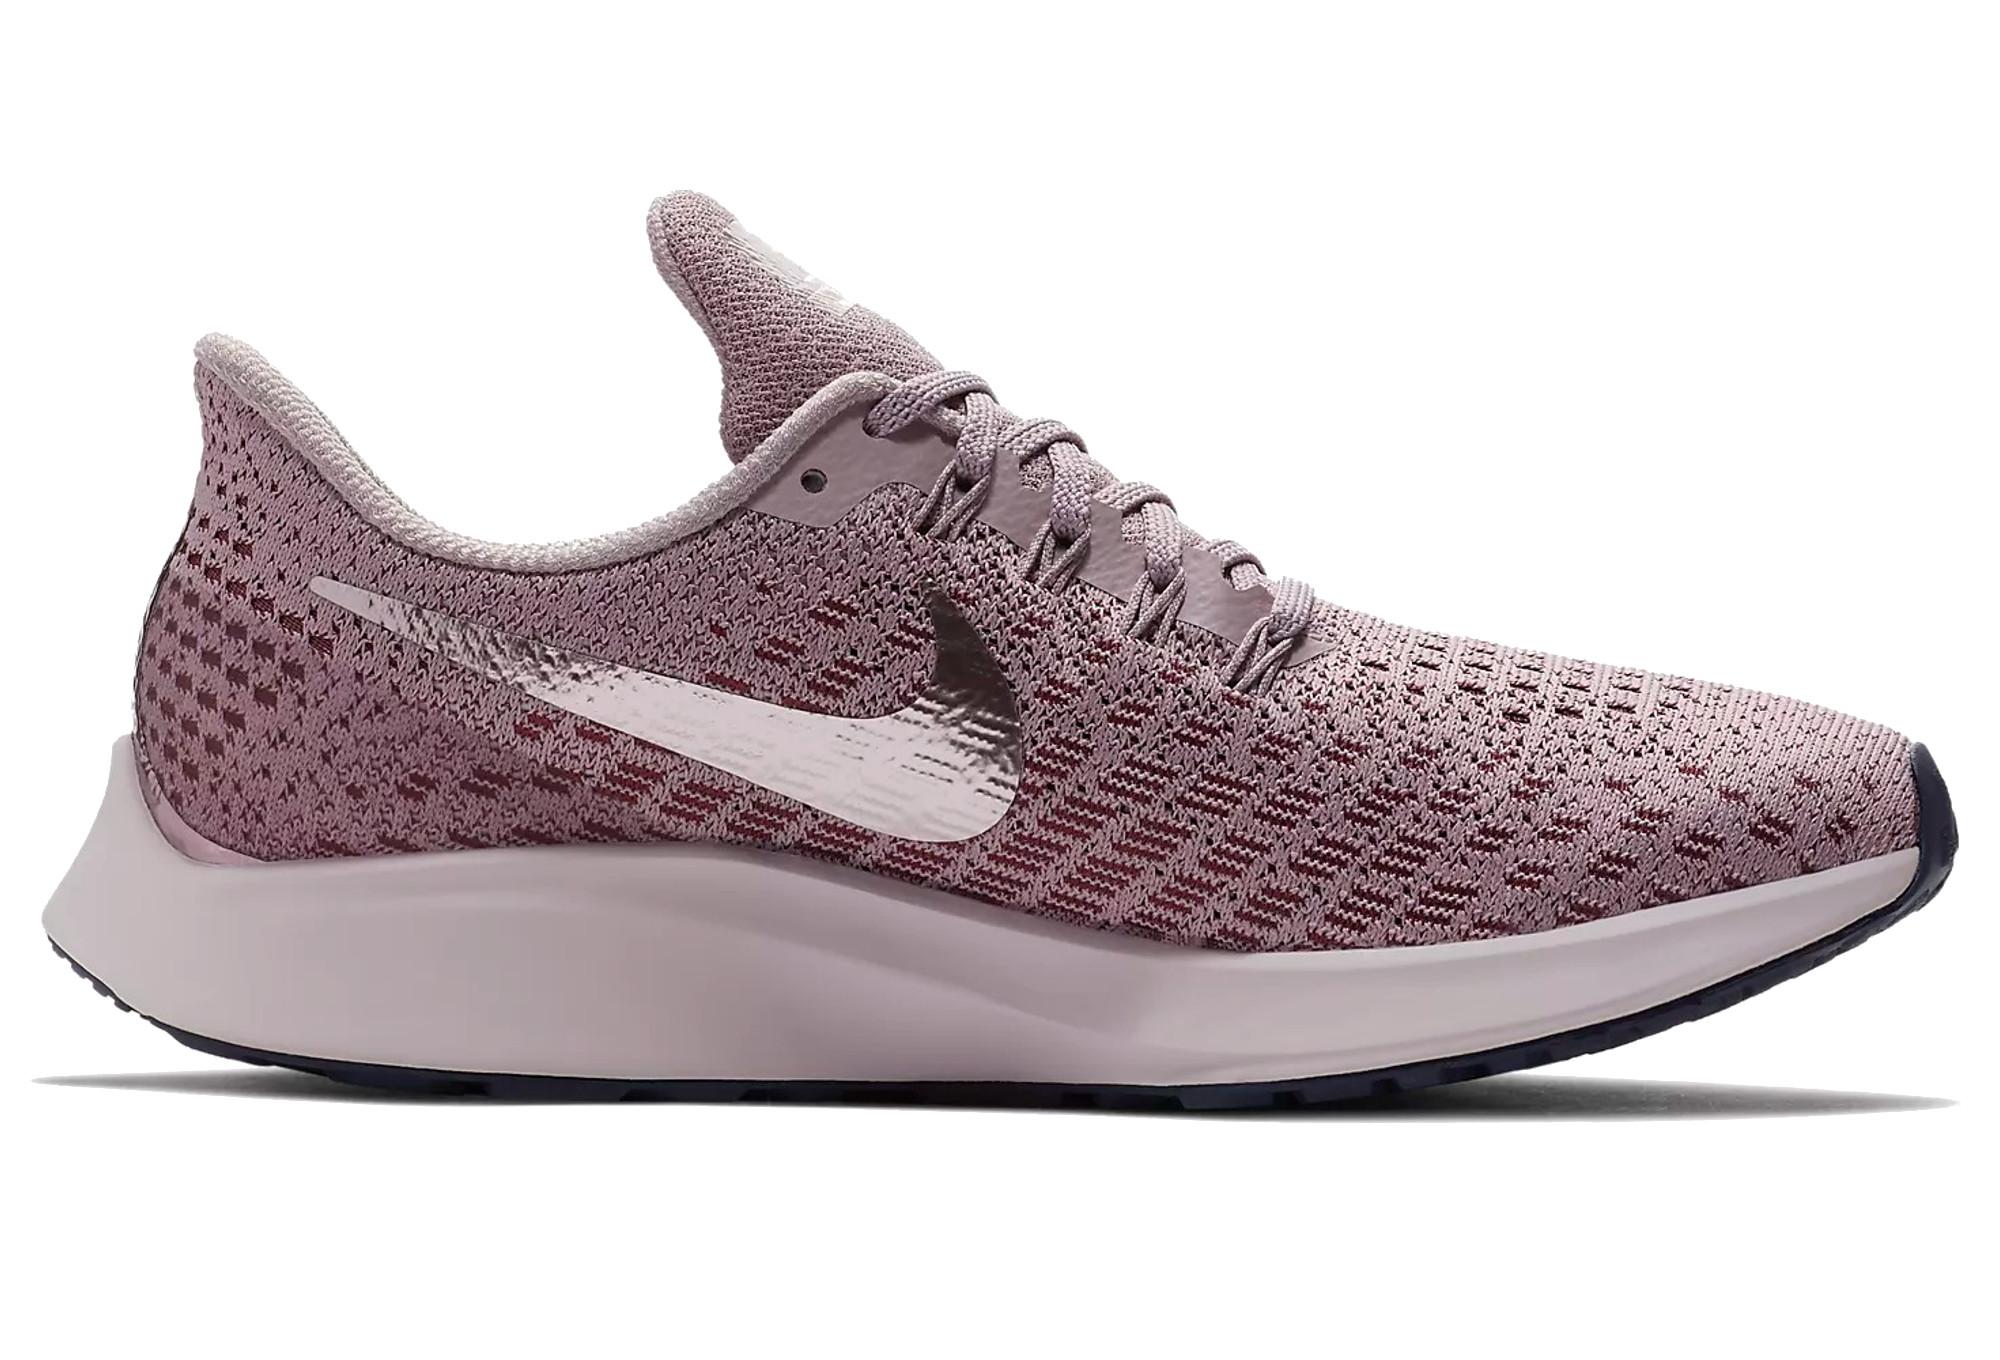 Chaussures de Running Femme Nike Air Zoom Pegasus 35 Rose